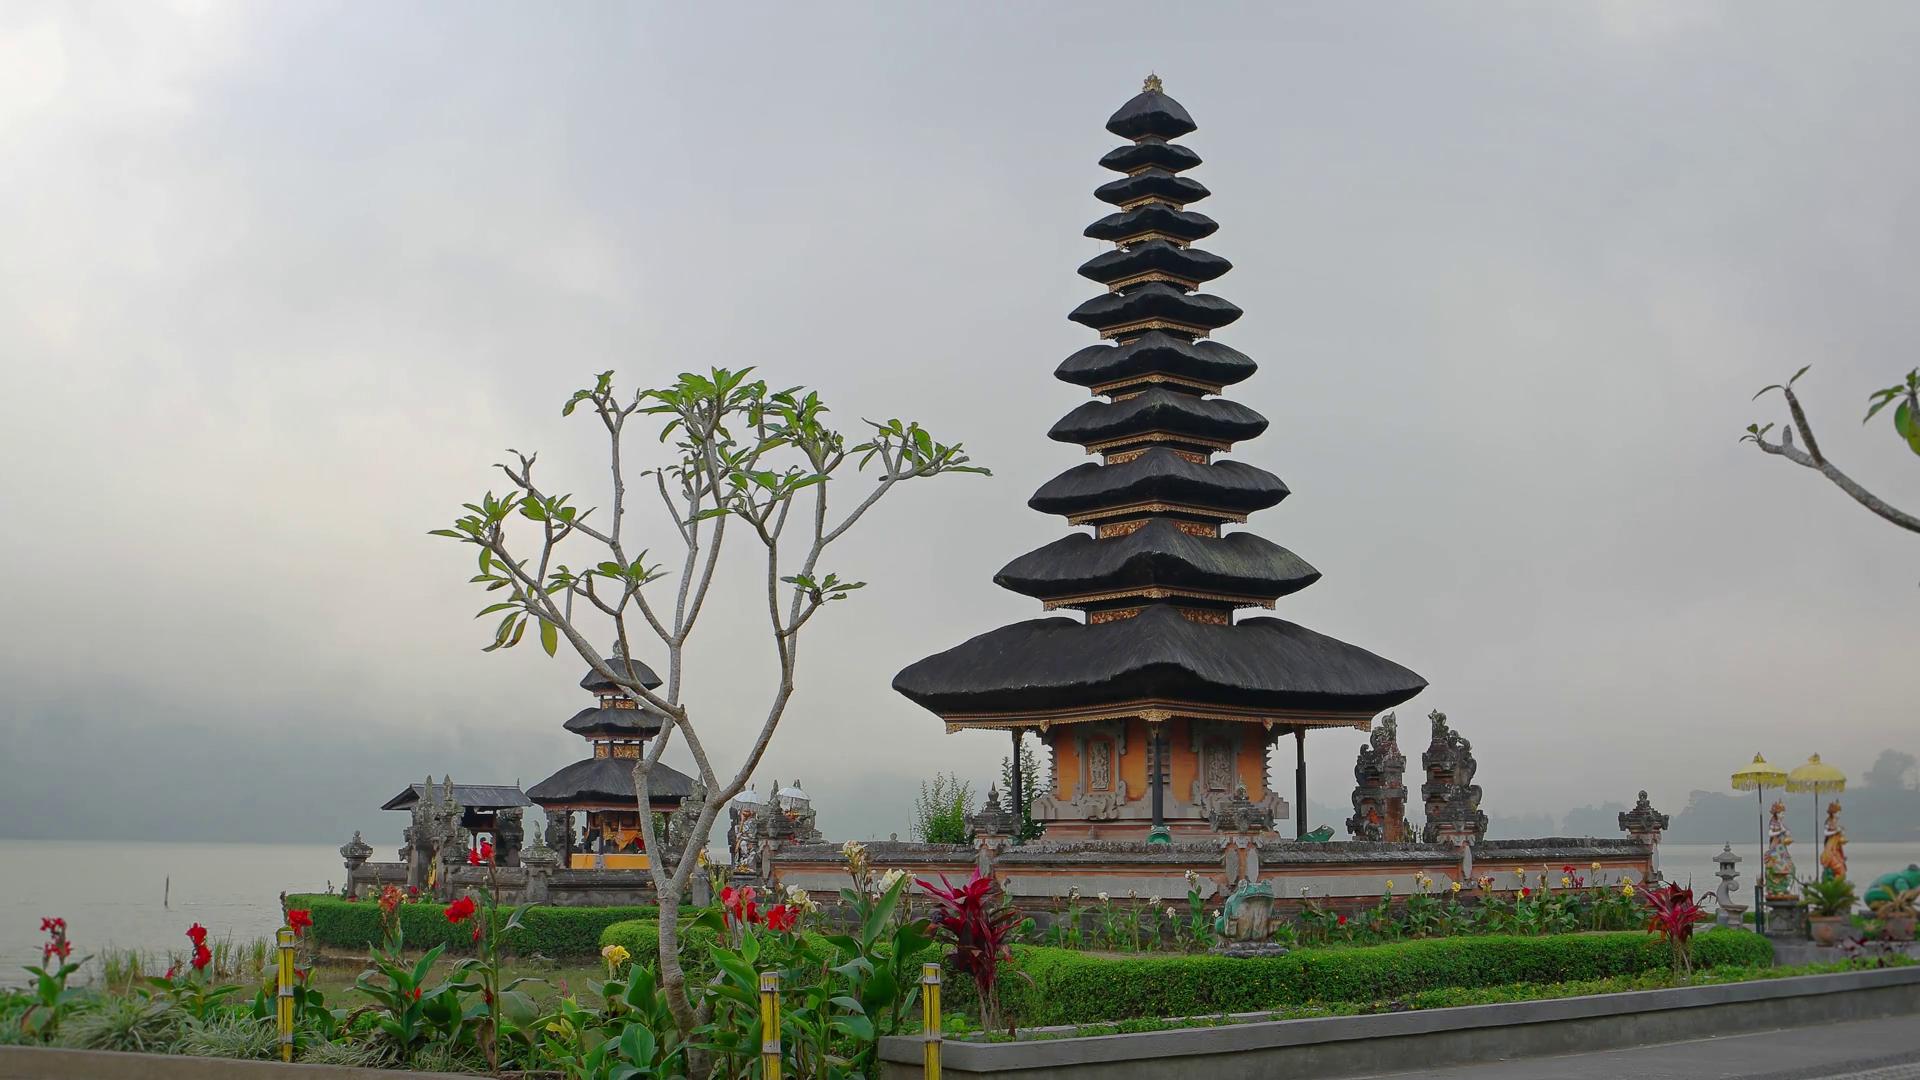 Exotic Tiered Pagodas Pura Ulun Danu Bratan Temple Bali Stock